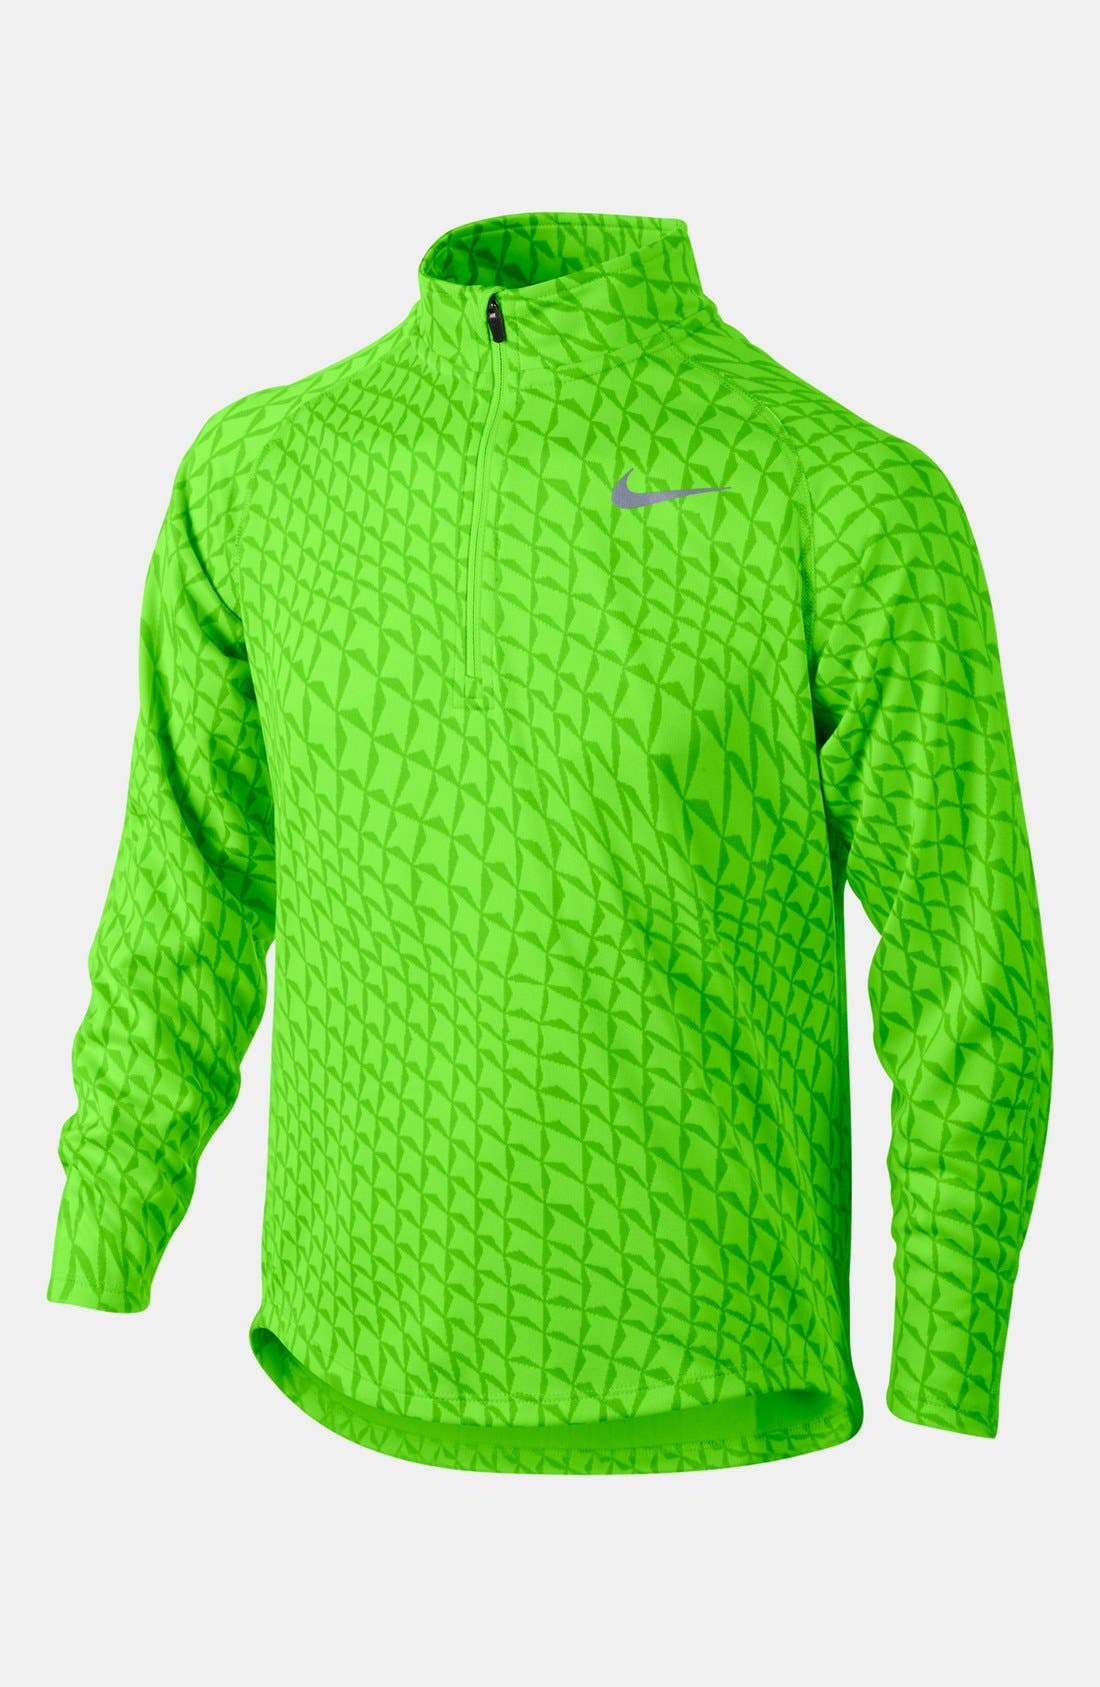 Main Image - Nike 'Element' Dri-FIT Half Zip Running Top (Big Boys)